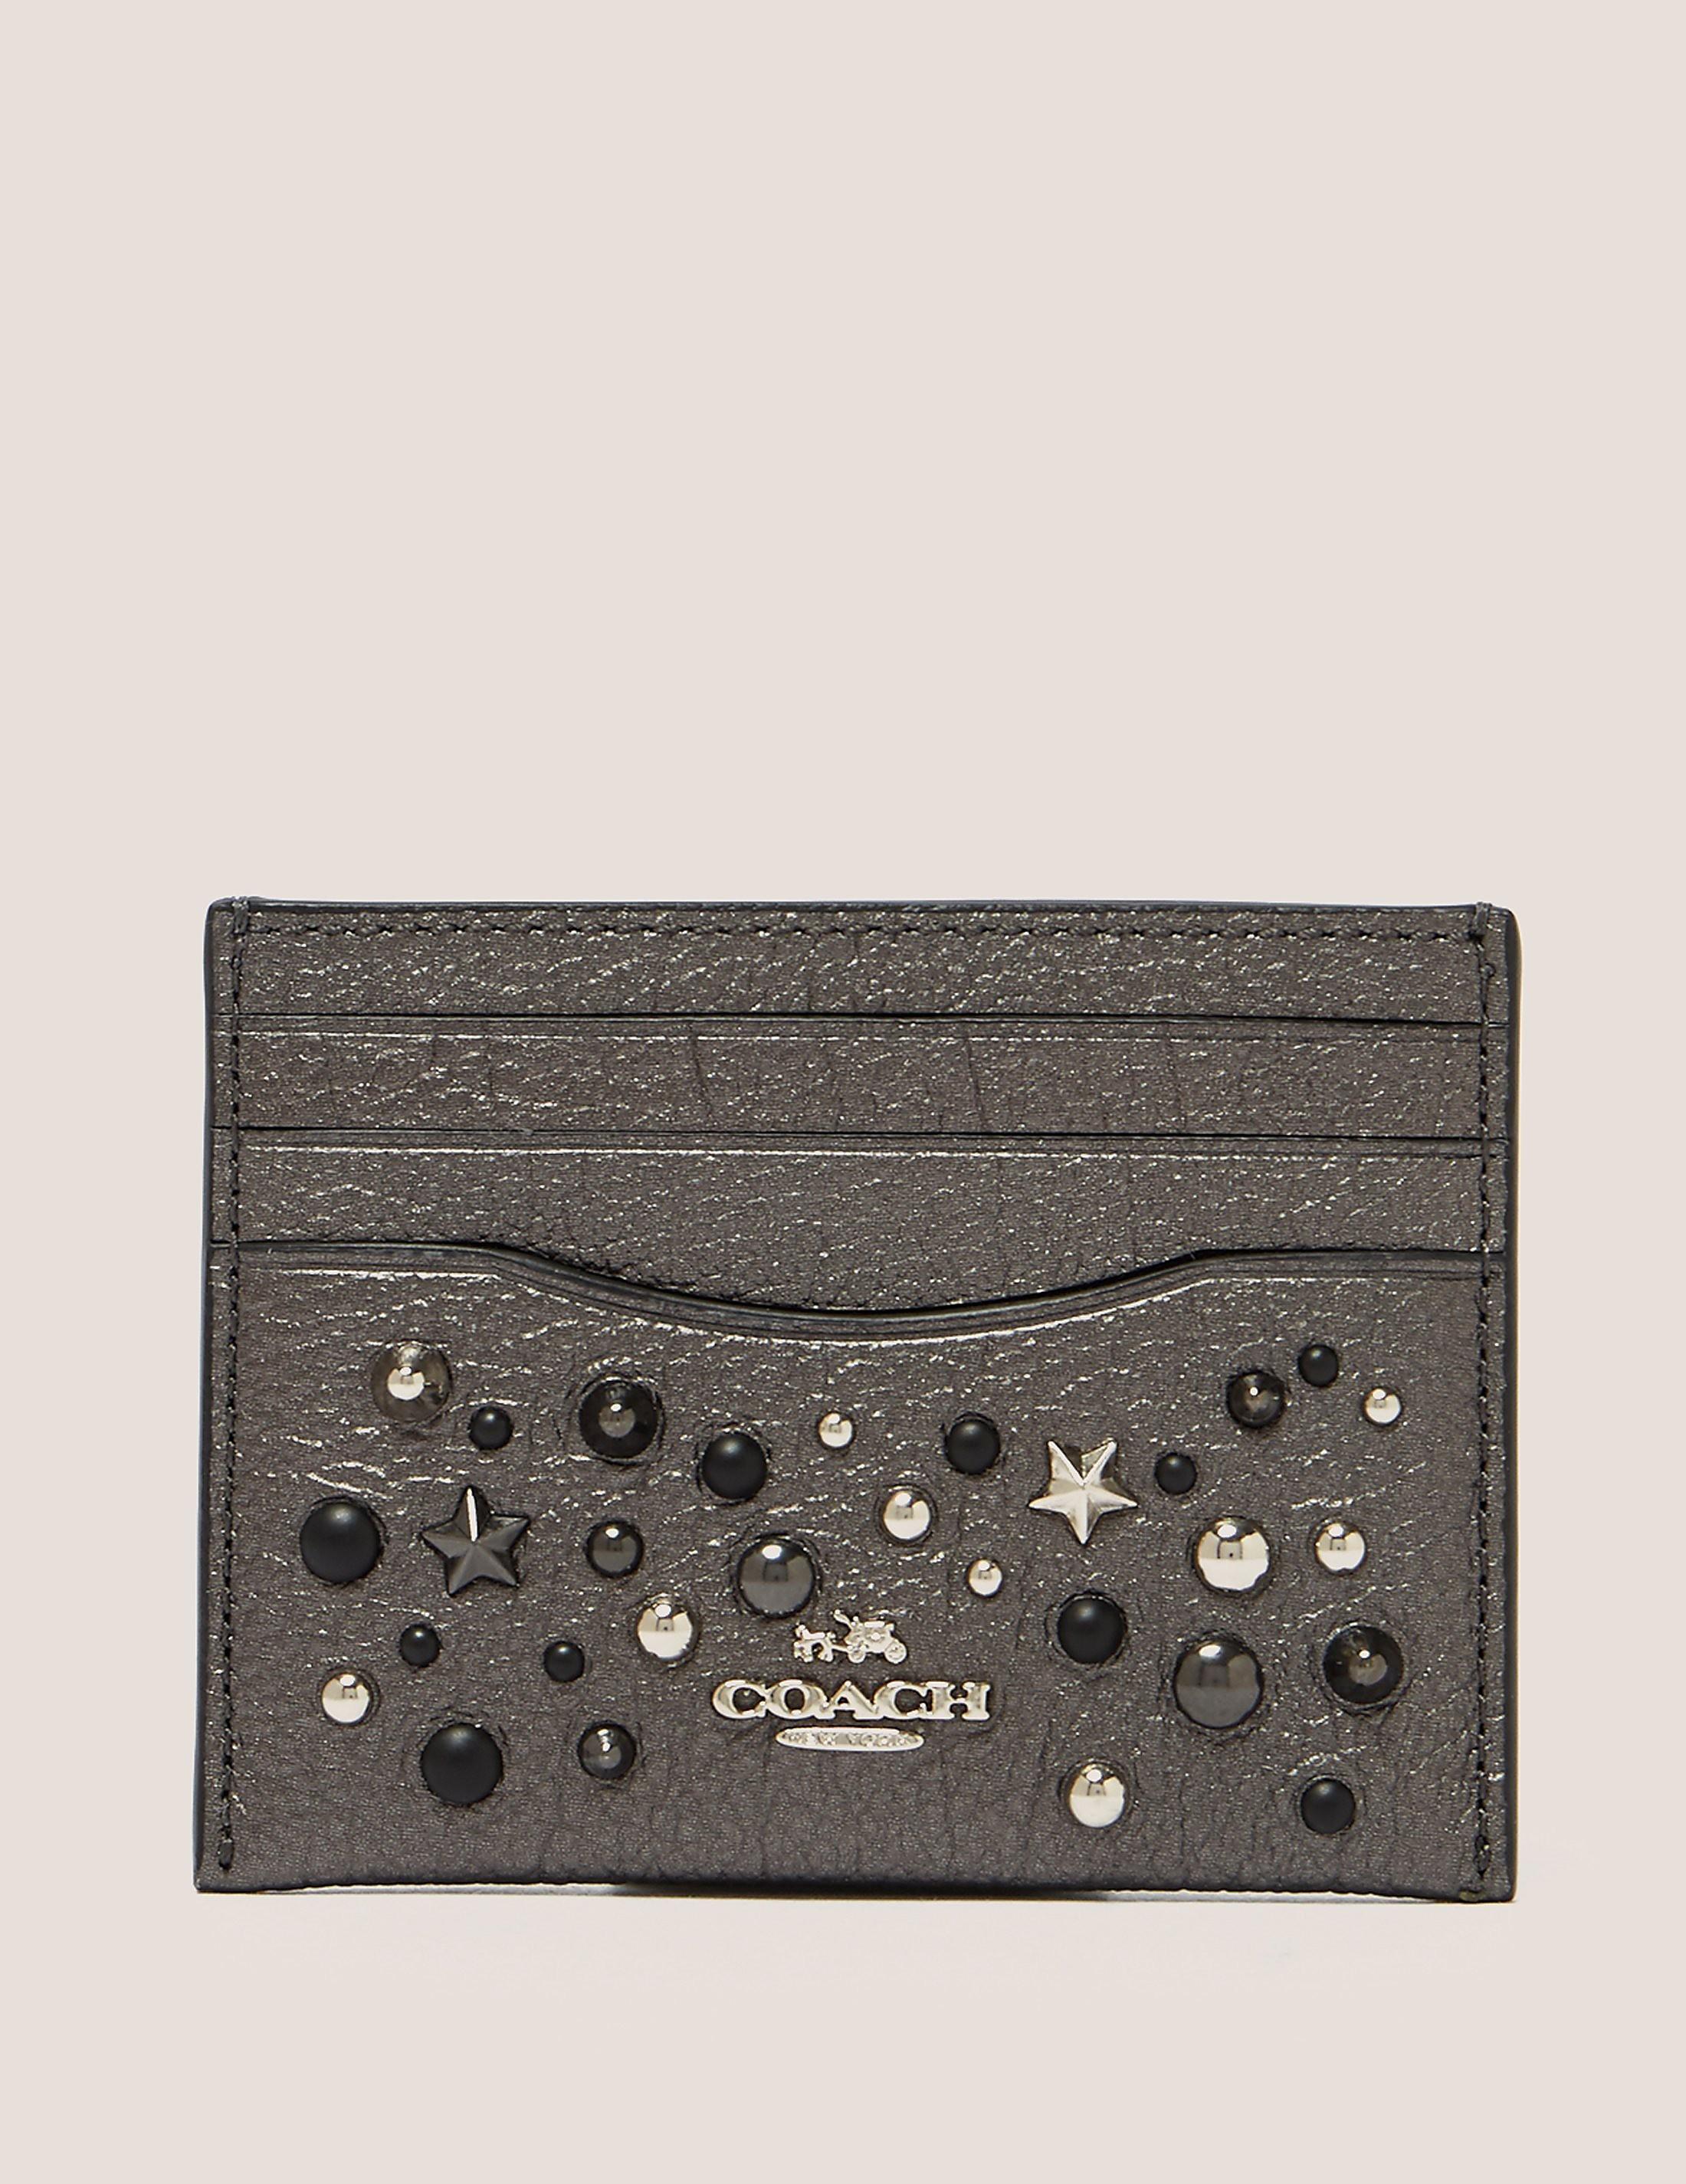 COACH Embellished Card Case